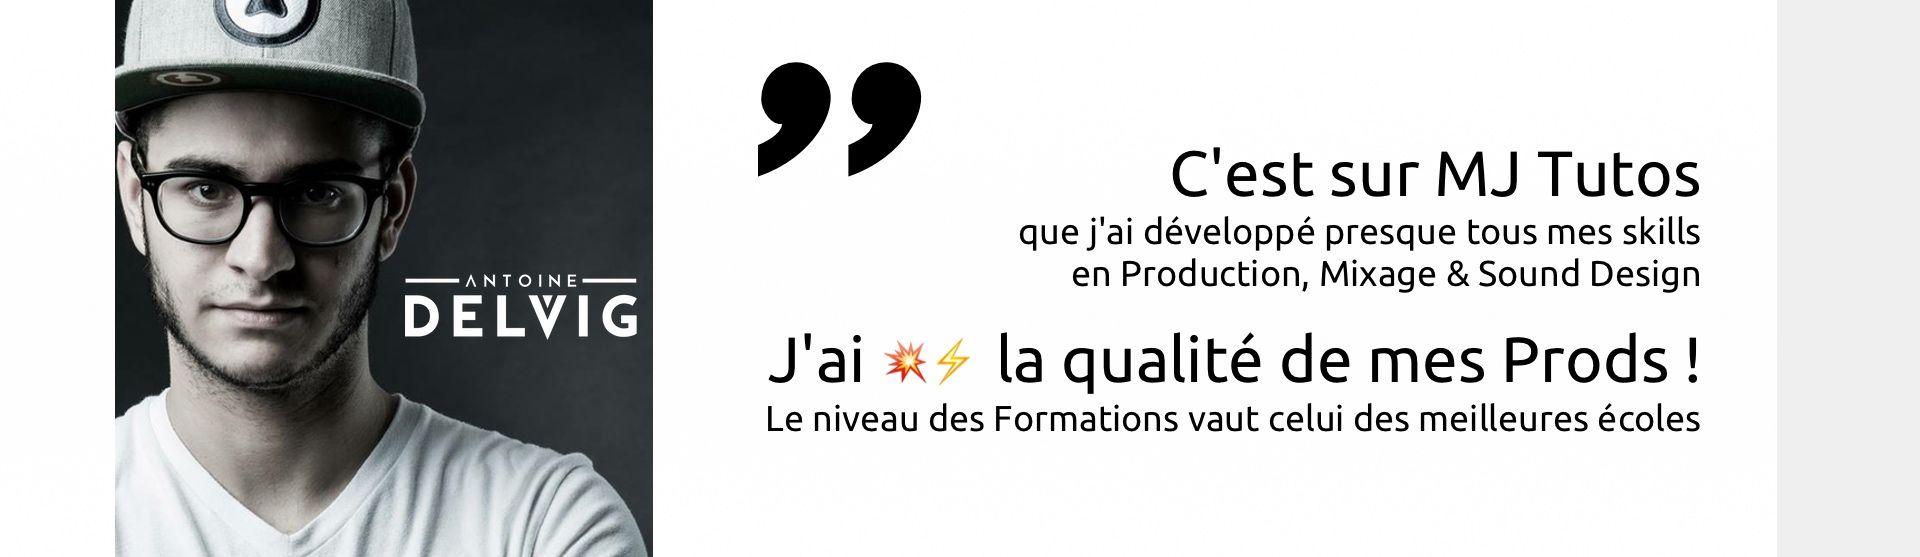 Antoine Delvig recommande MJ Tutoriels<span></span>